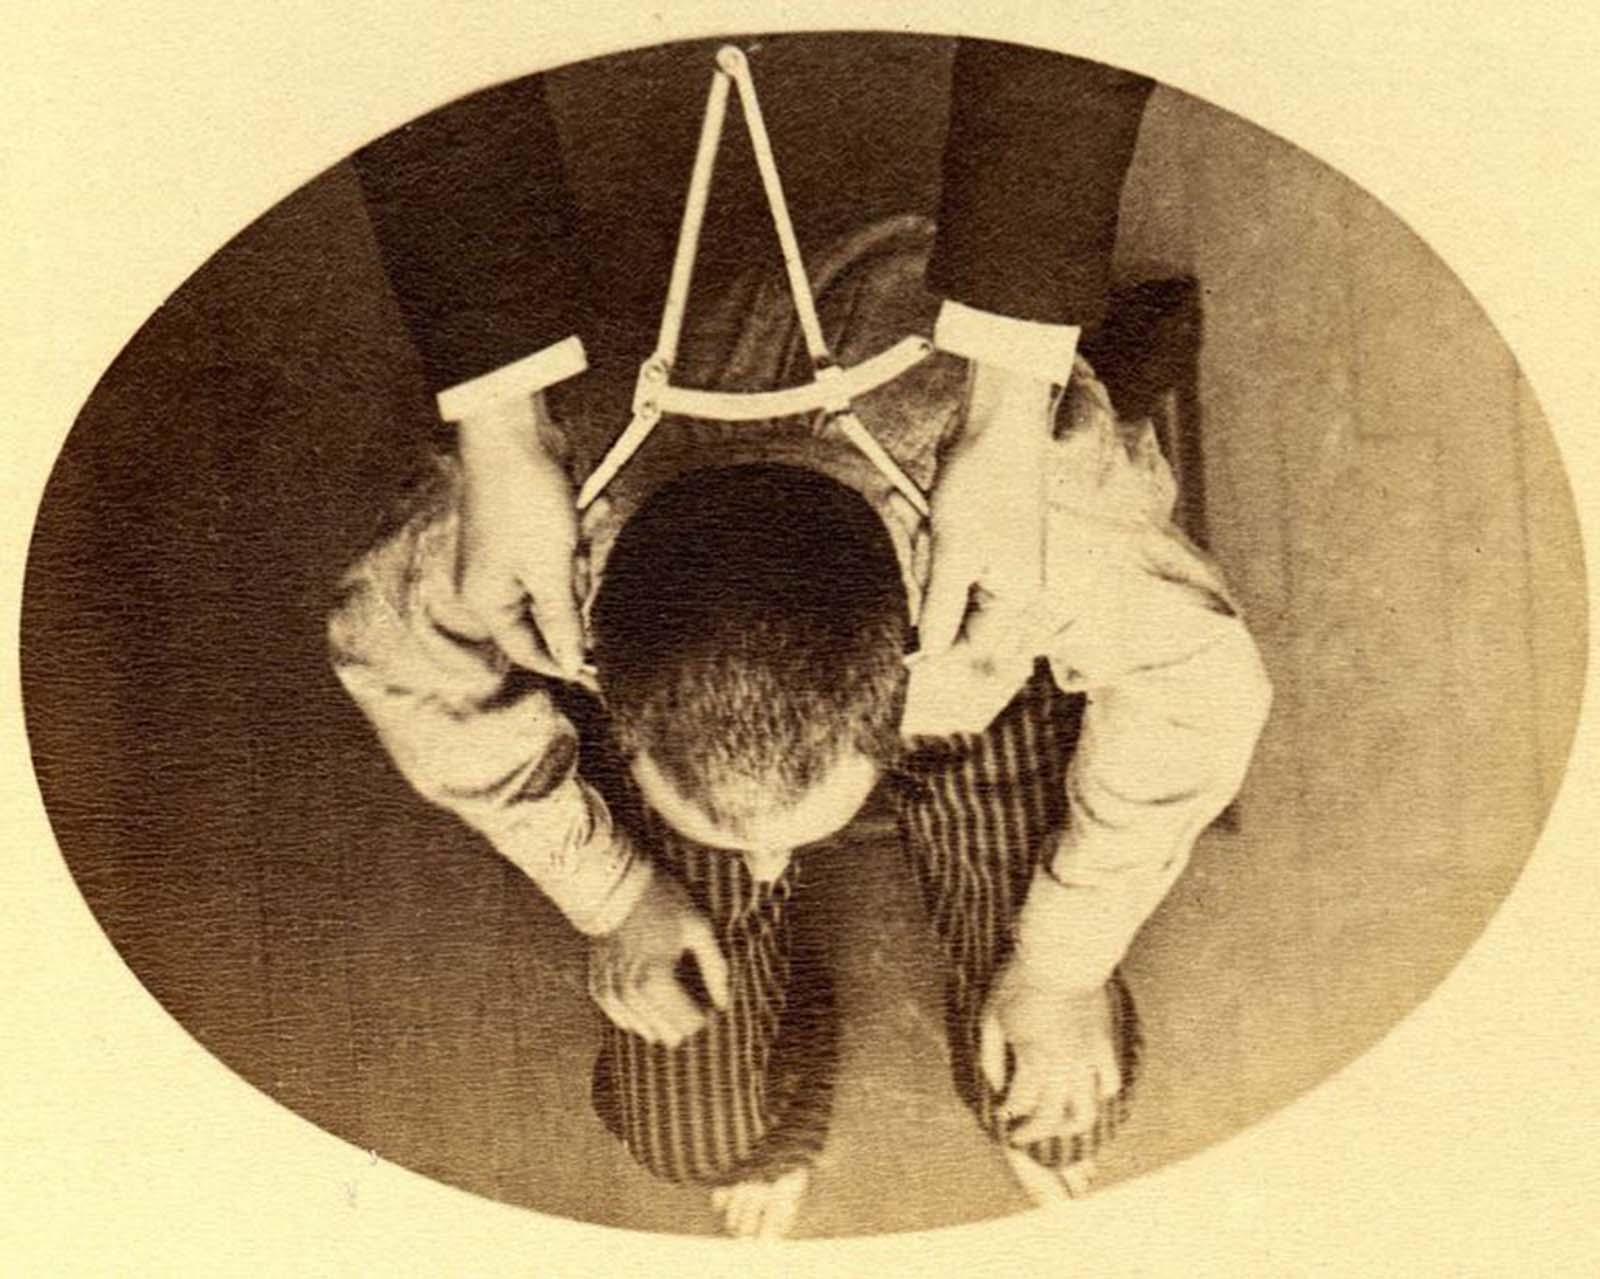 bertillon system rare photographs